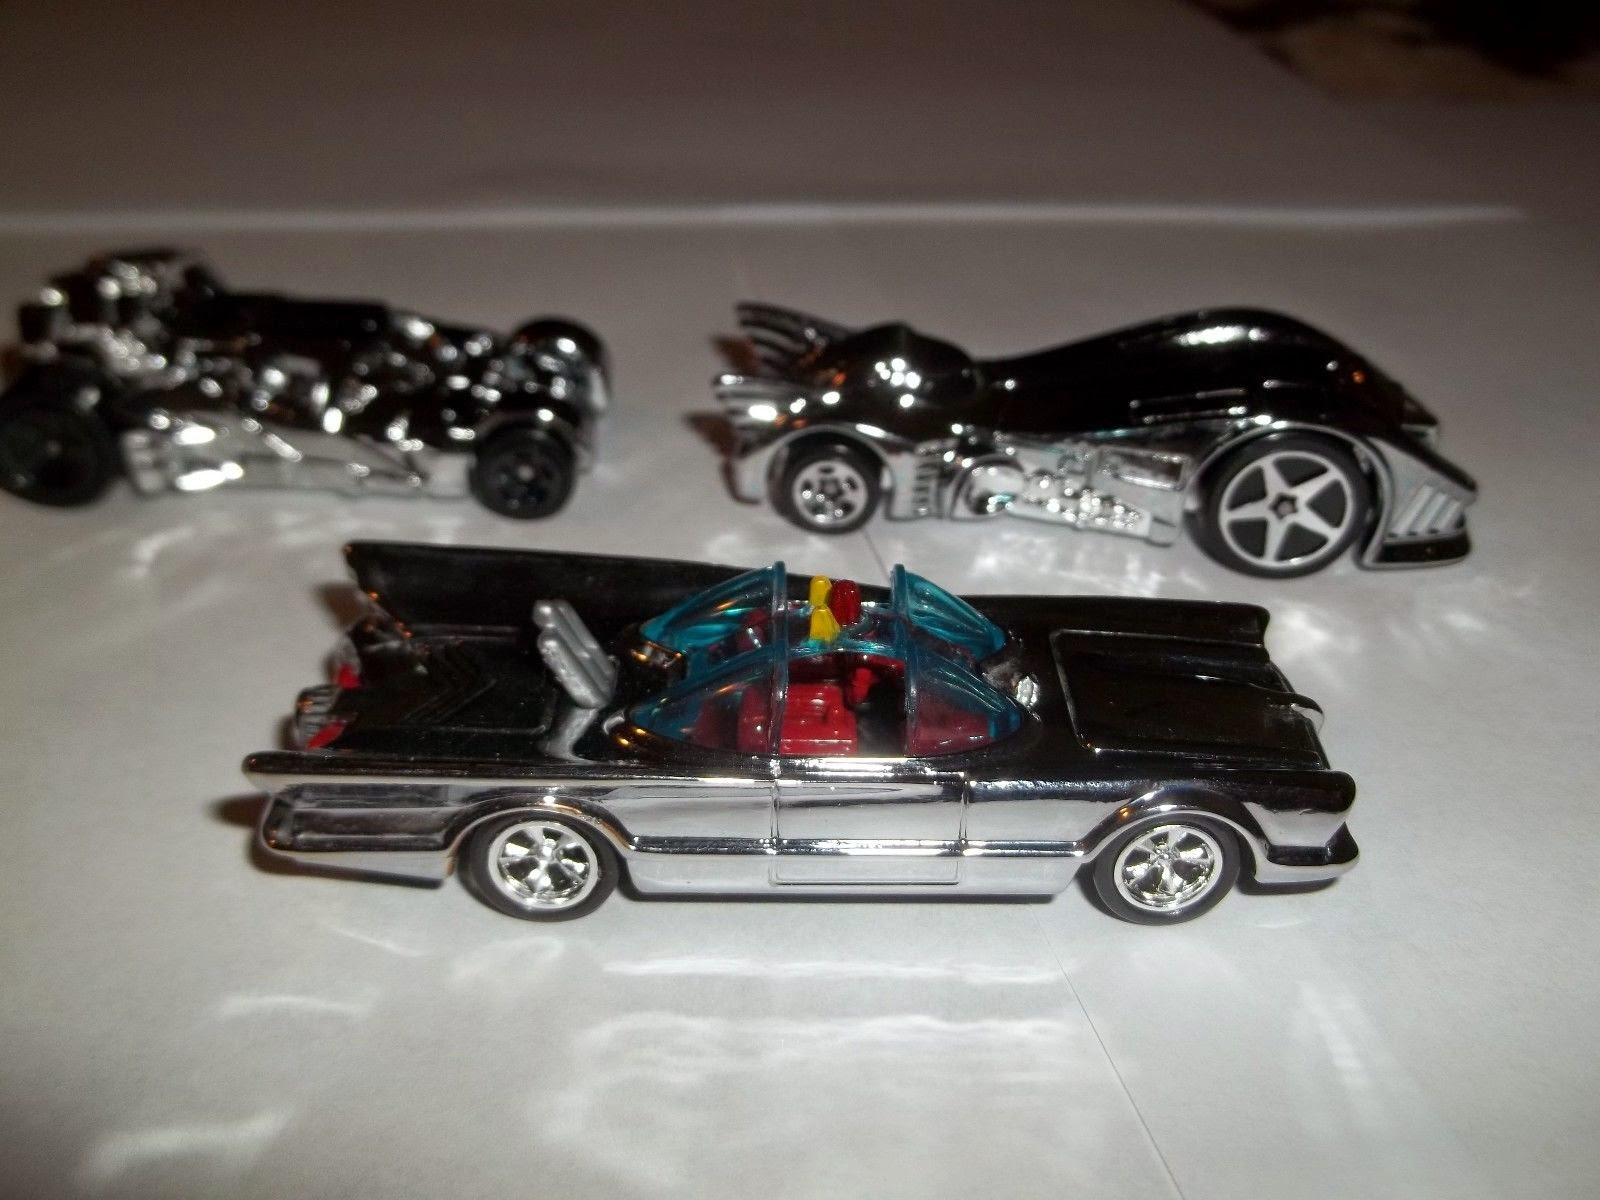 Batmobile-info: 2012 Hotwheels Batmobile In Shiny Silver